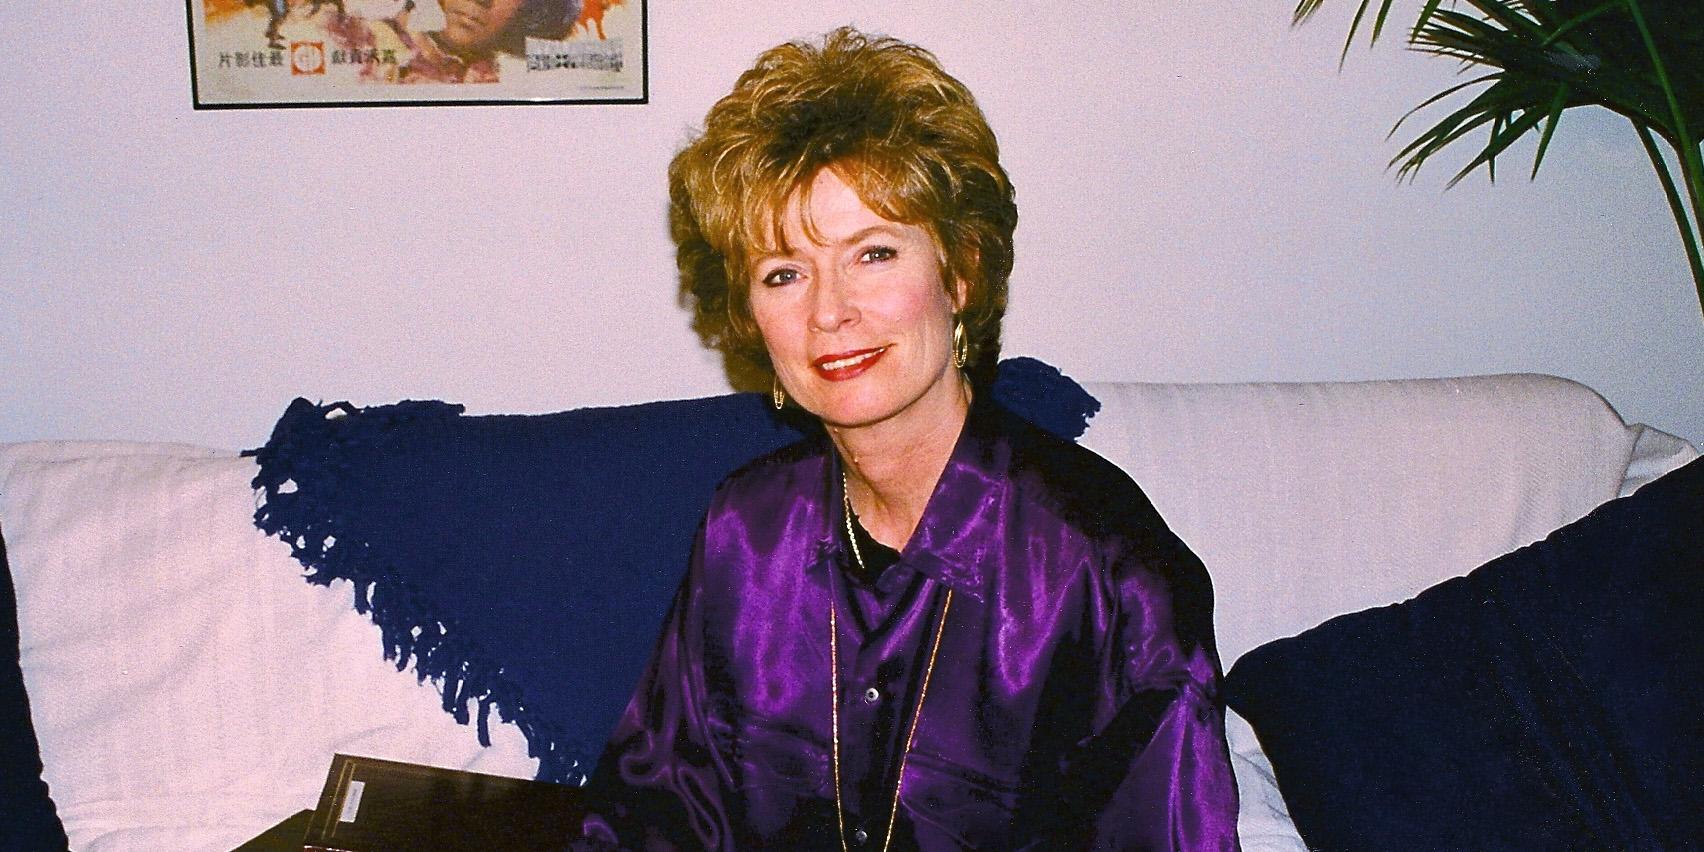 Linda Lee Cadwell – Bruce Lee's Widow Net Worth. Biography